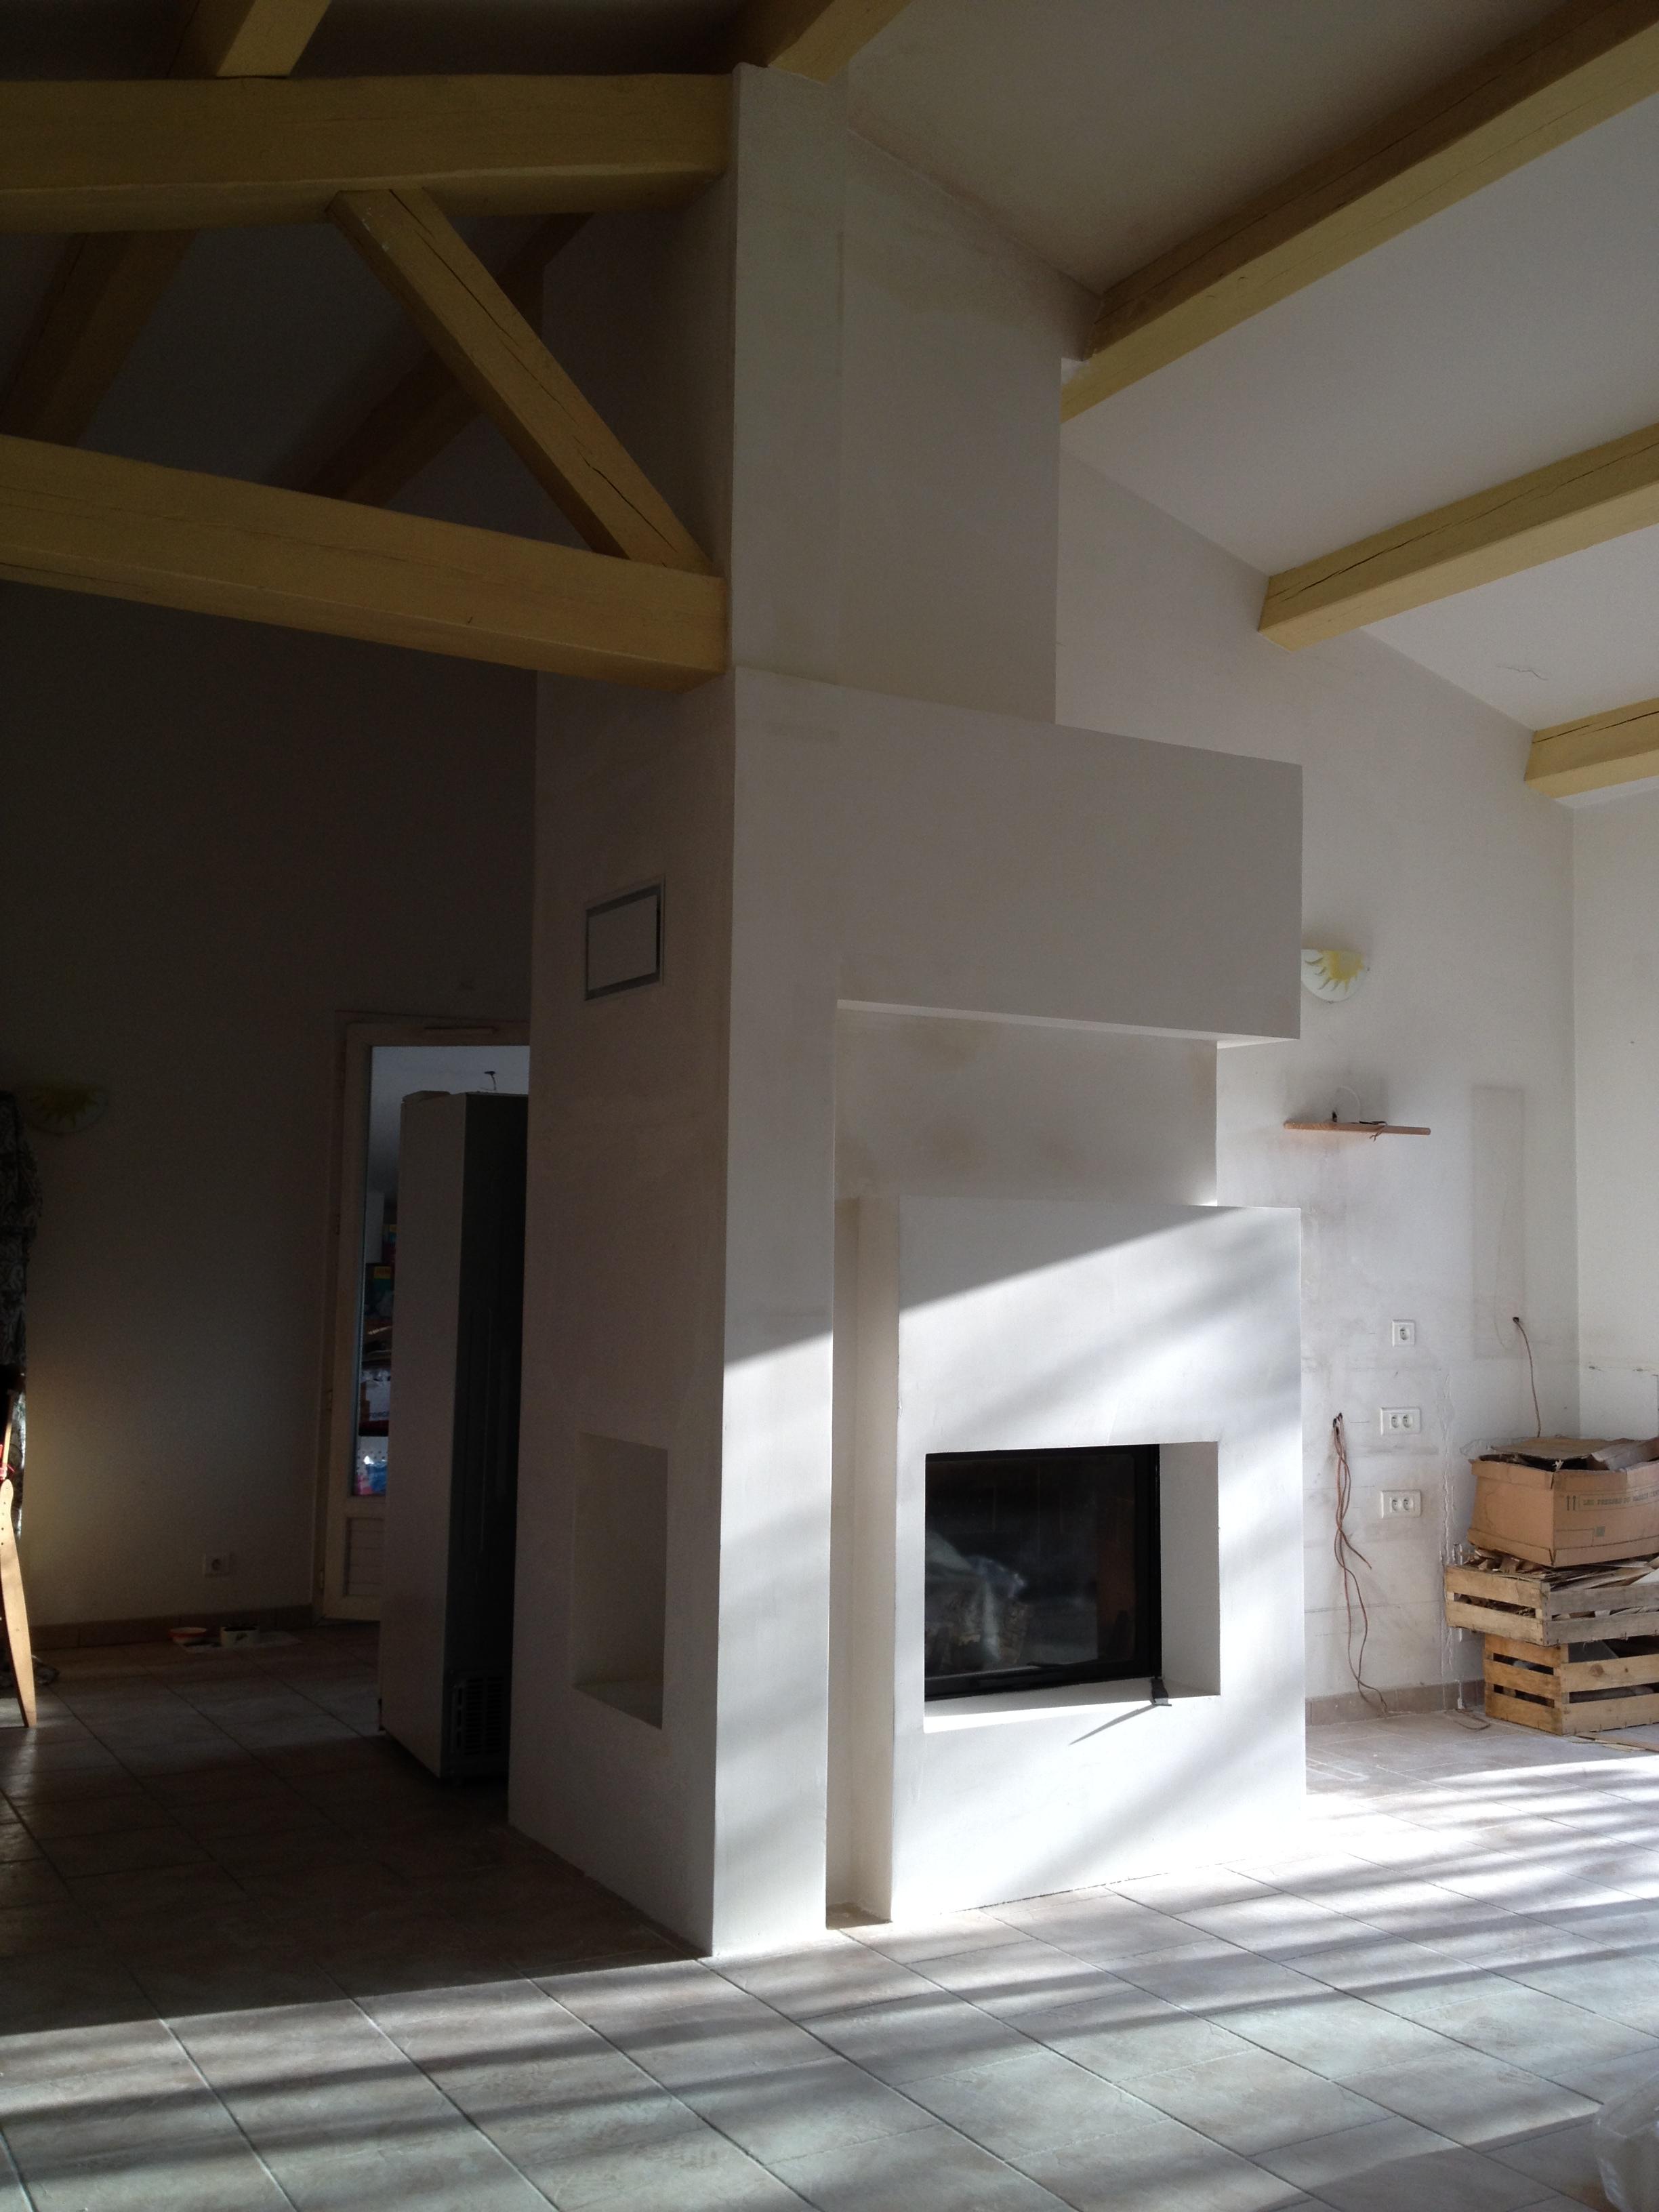 chemin e double face chemin e double face contemporaine vente chemin es haut de cheminee. Black Bedroom Furniture Sets. Home Design Ideas